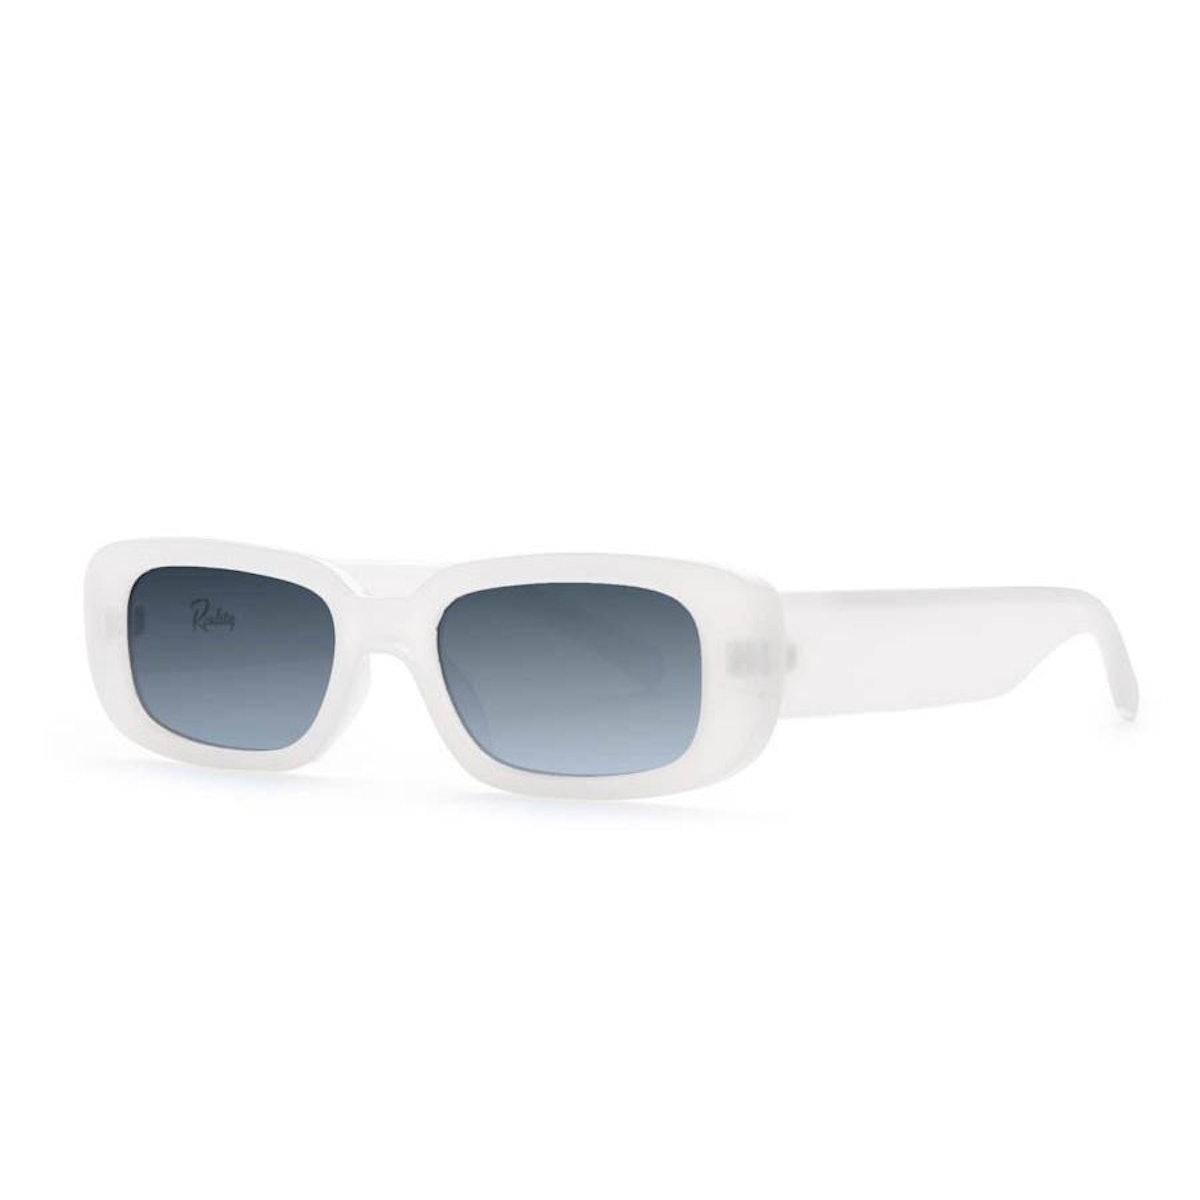 Reality Eyewear Xray specs sunglasses in white.